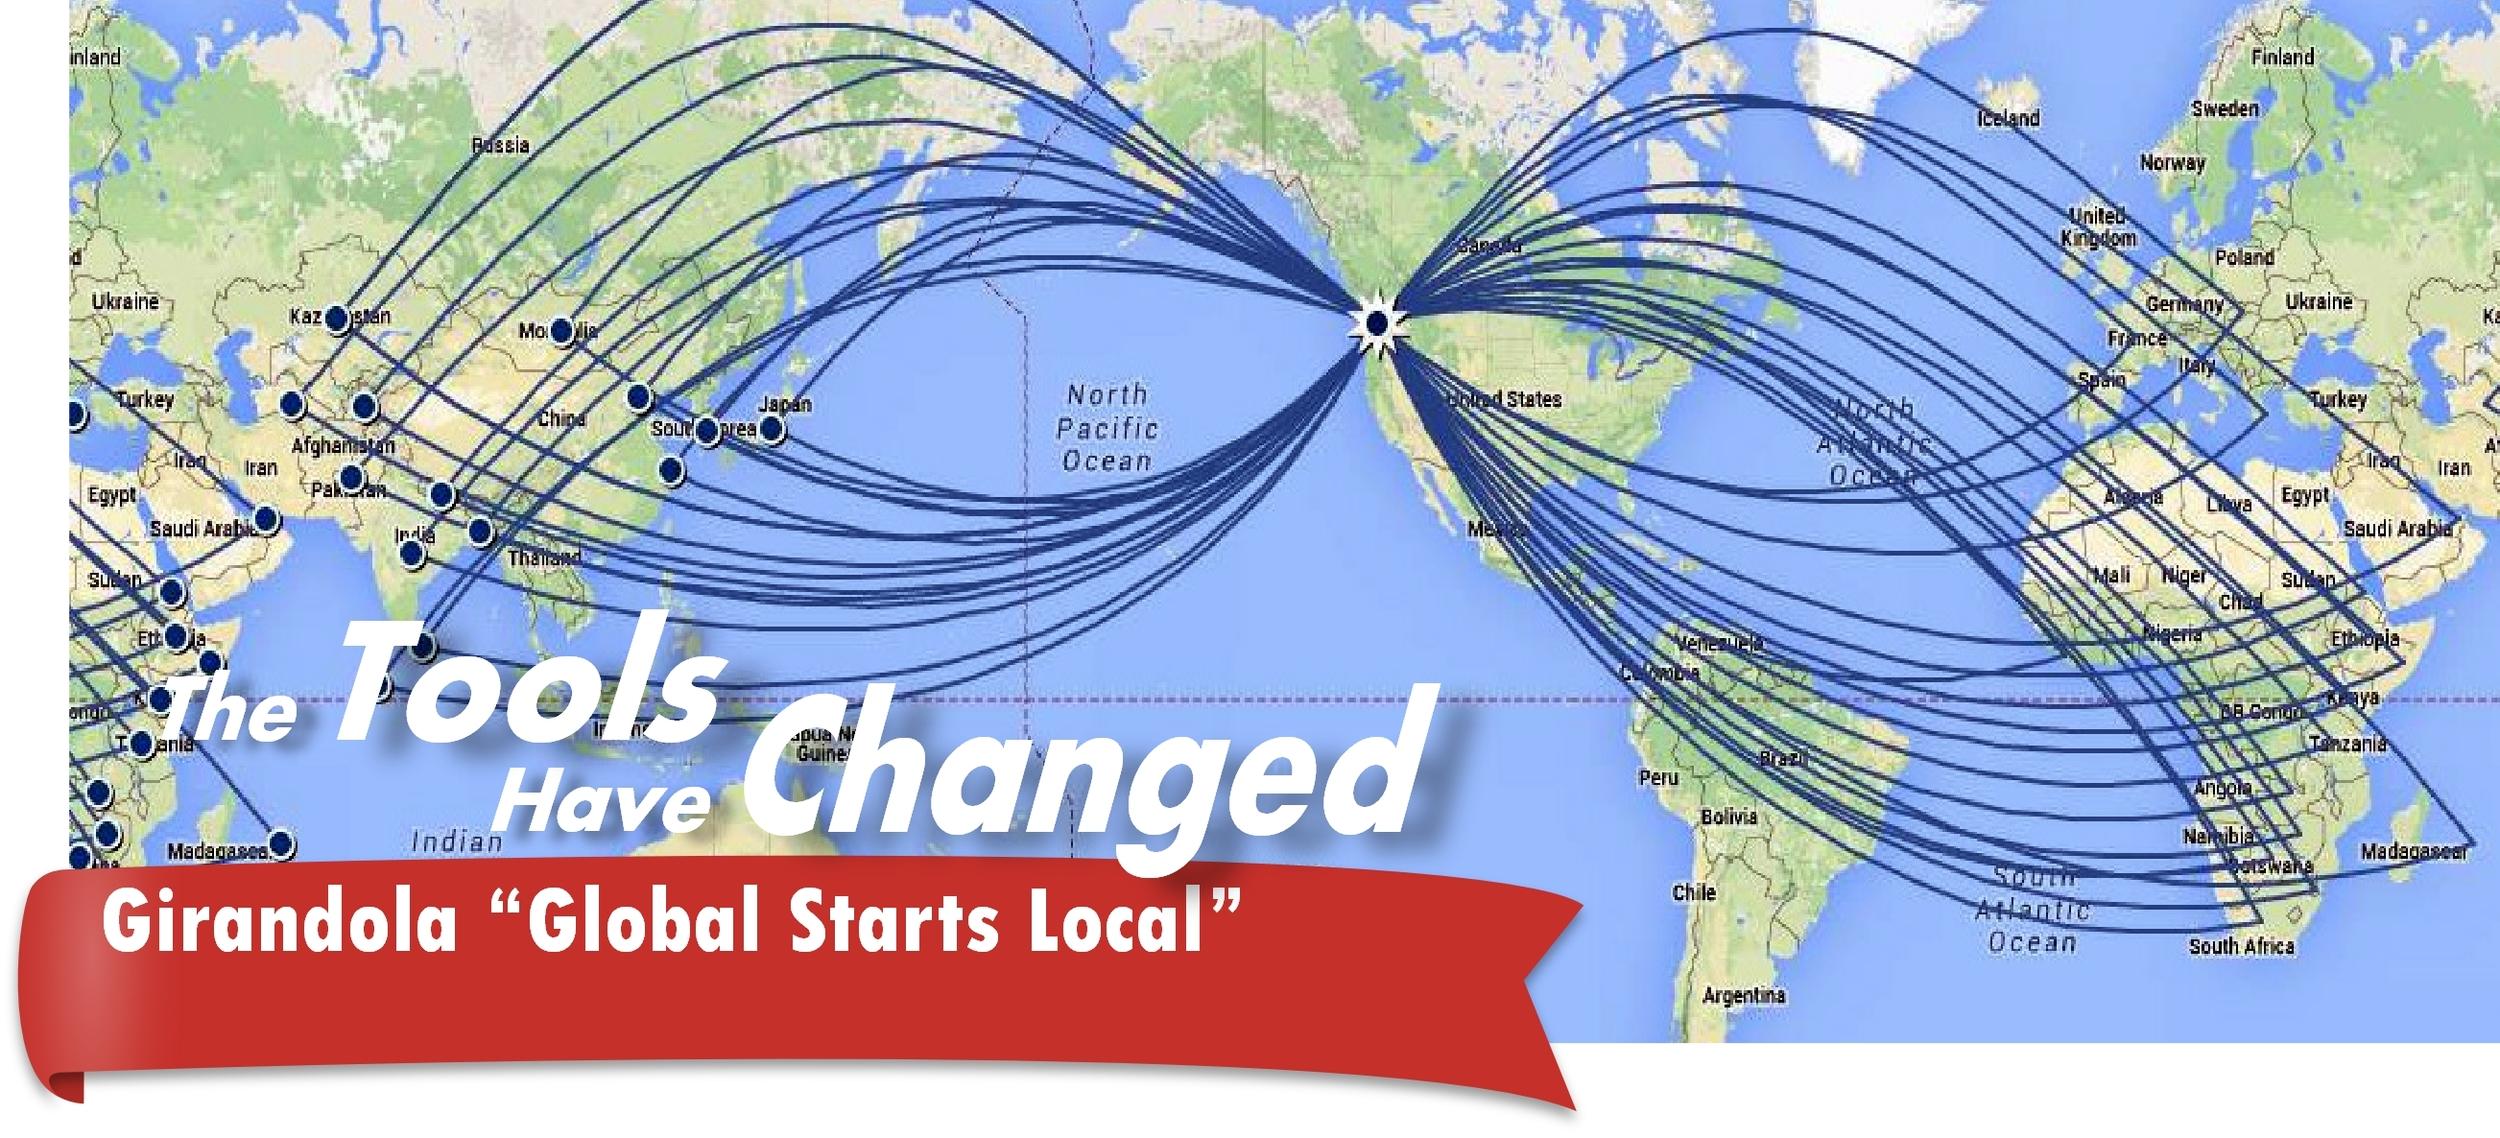 girandola global starts local.jpg